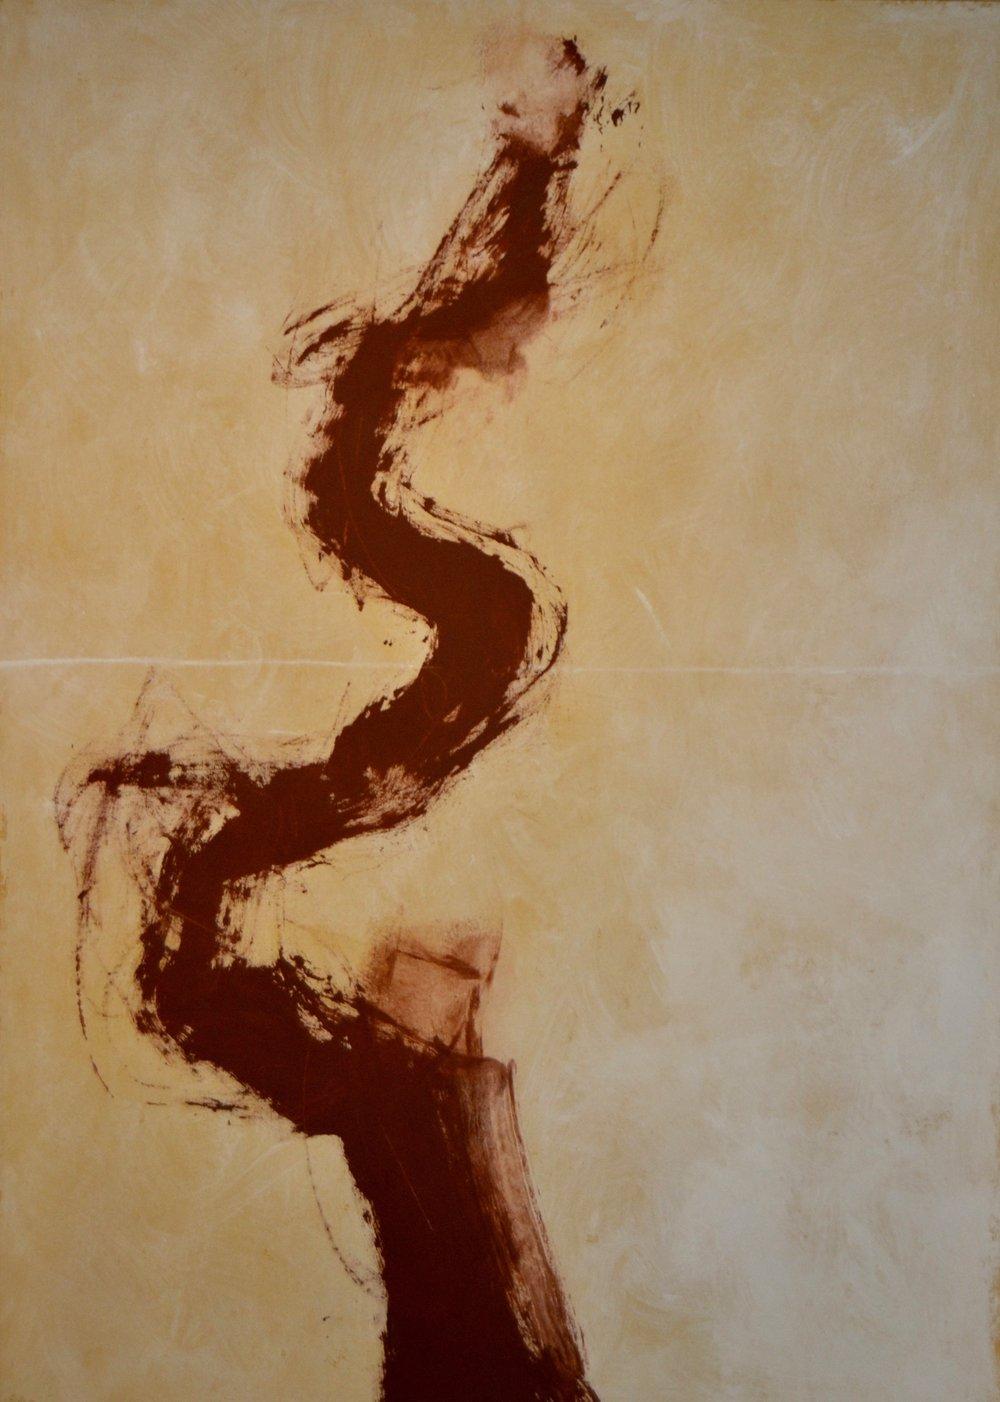 Scion, 1990 Acrylic on canvas 70 x 50 inches